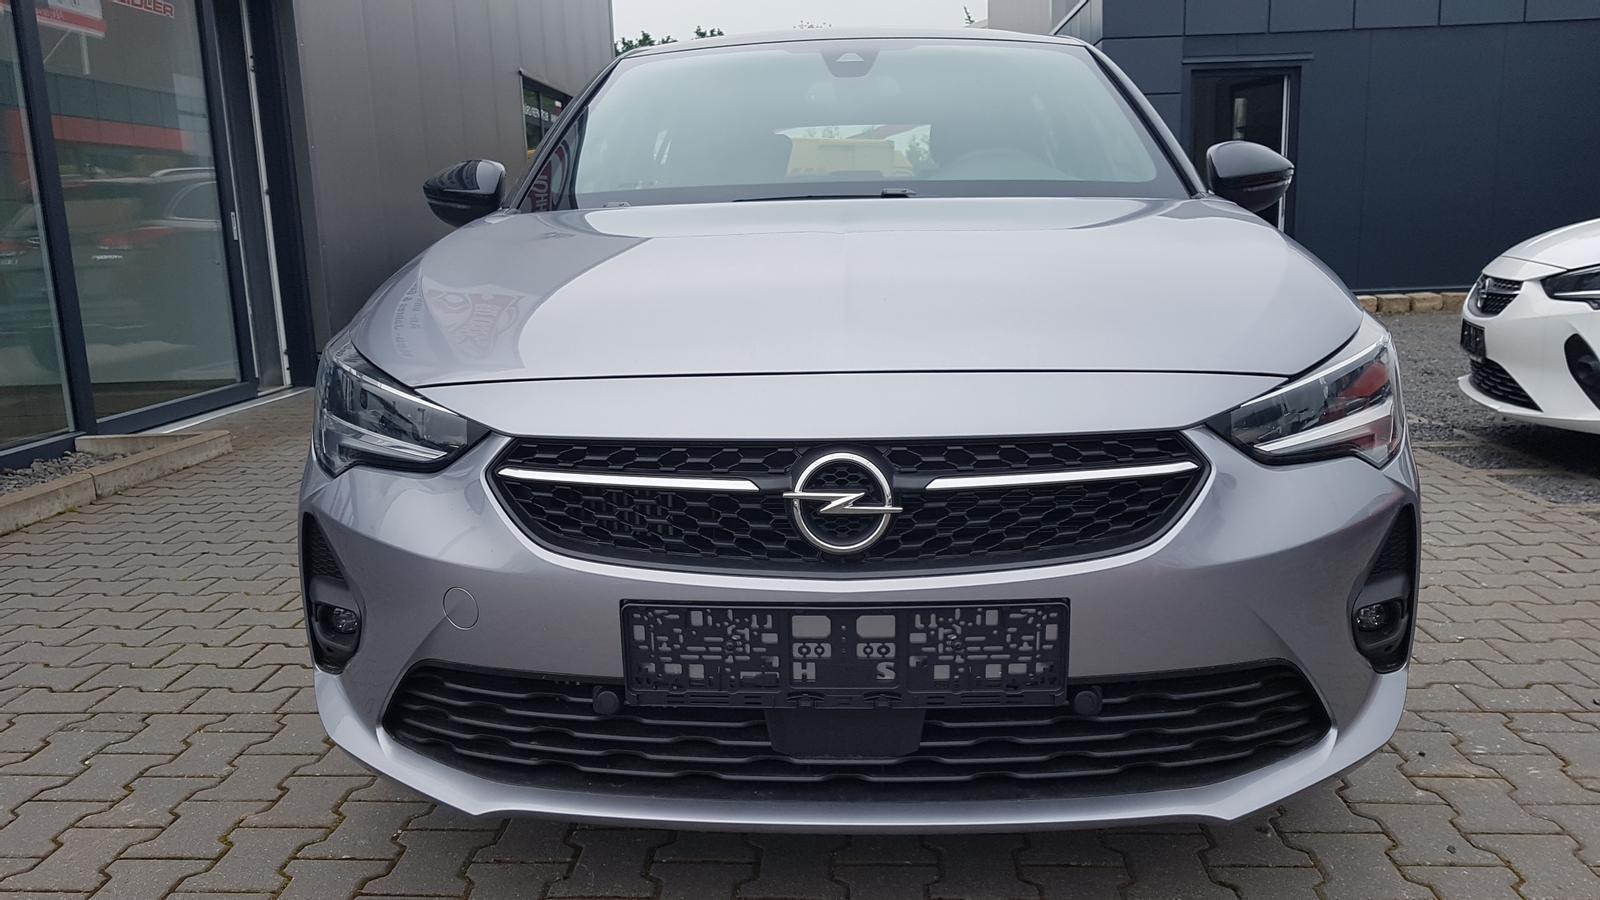 Opel Corsa F GS Line*LED*Shzg*PDC*Cam*16Zoll*AppleCar